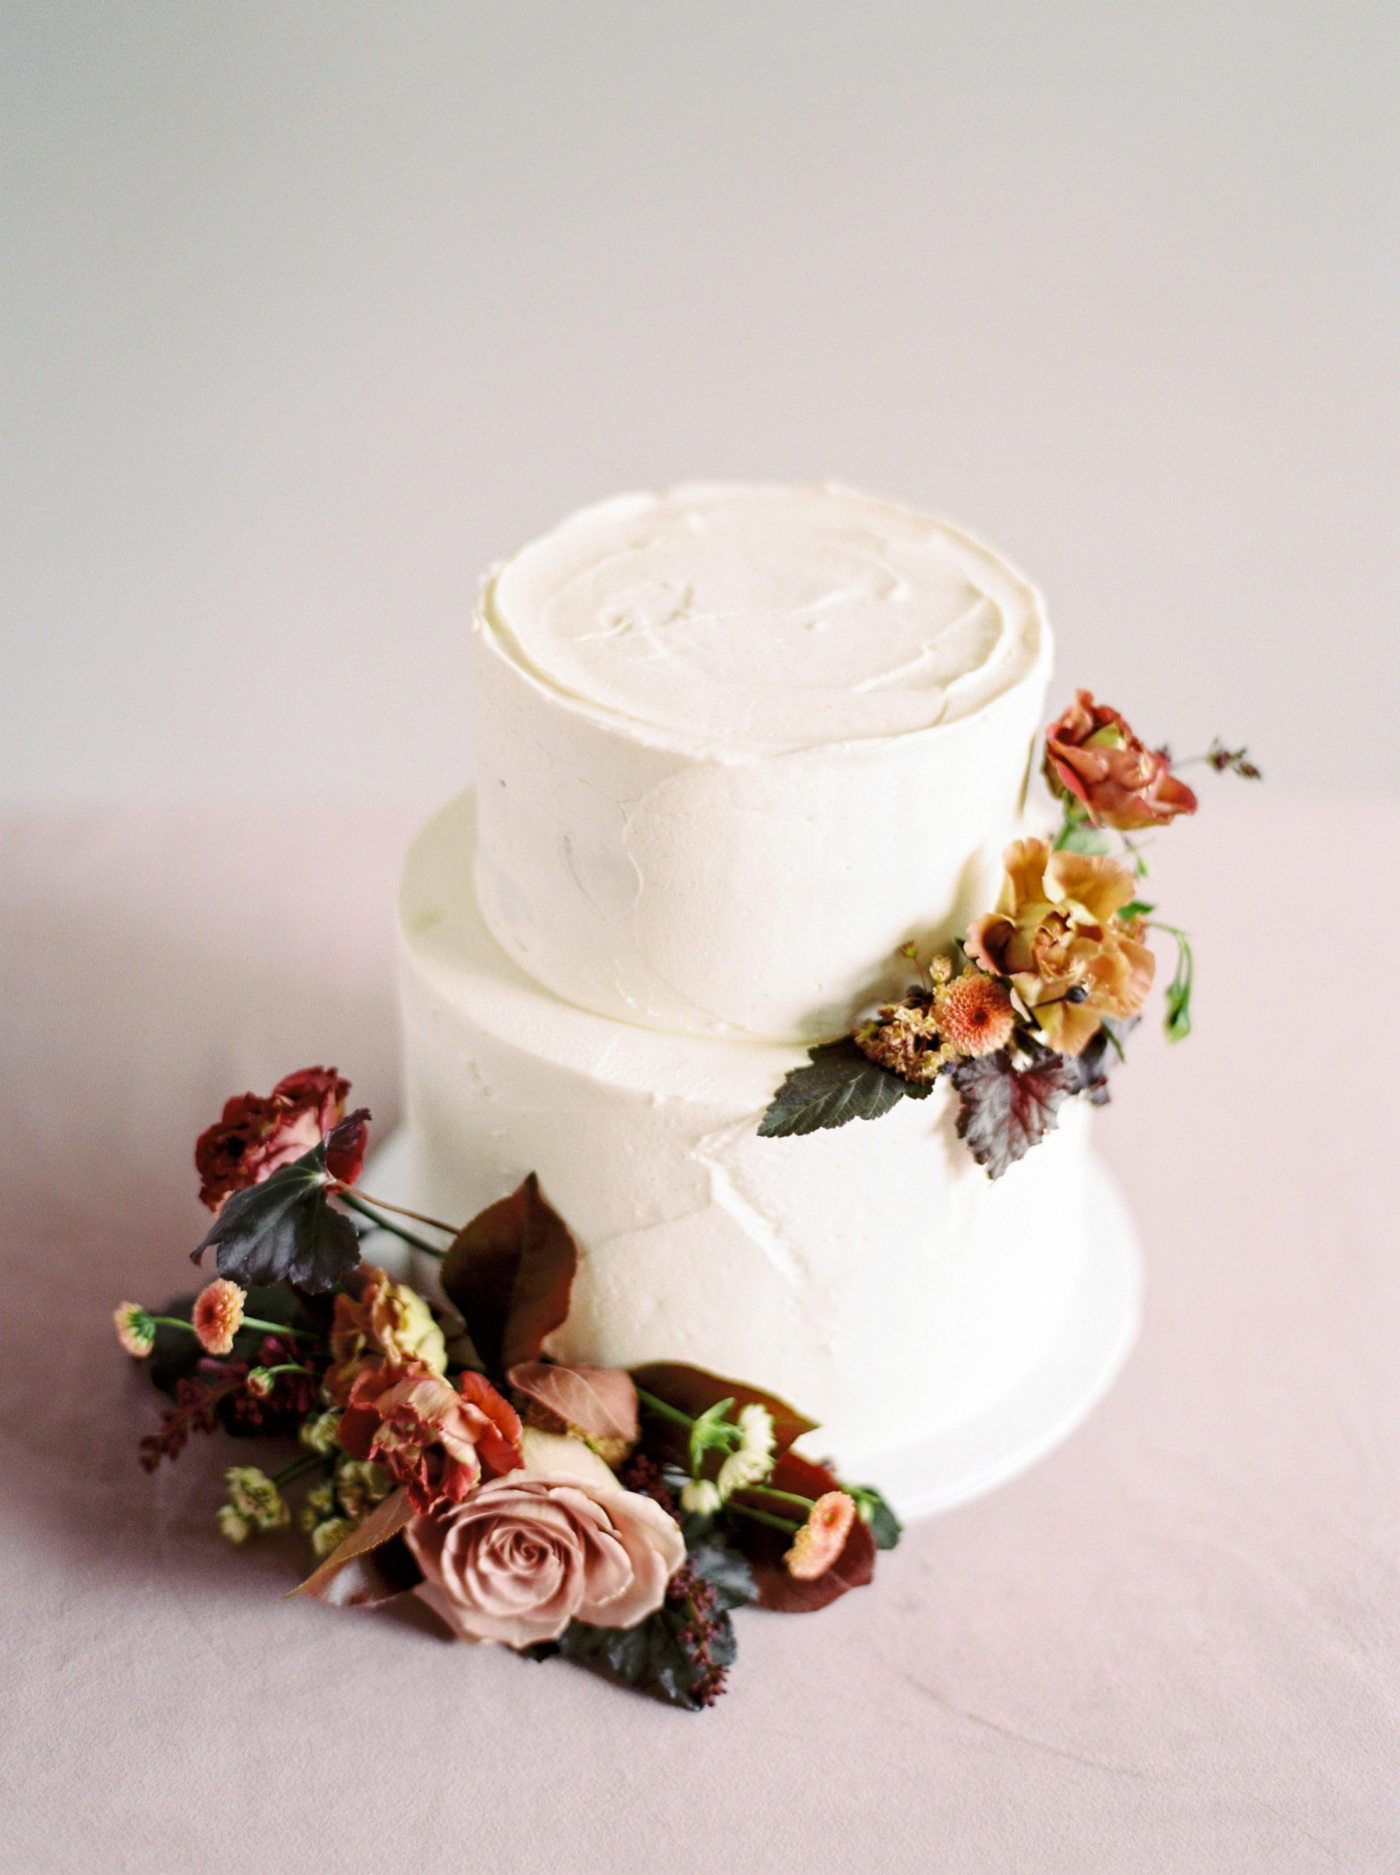 Stacey Foley Design Joy Wed Fine Art Series Photography Workshop | Banff wedding photographers | Rimrock resort wedding | wedding cake with floral topper